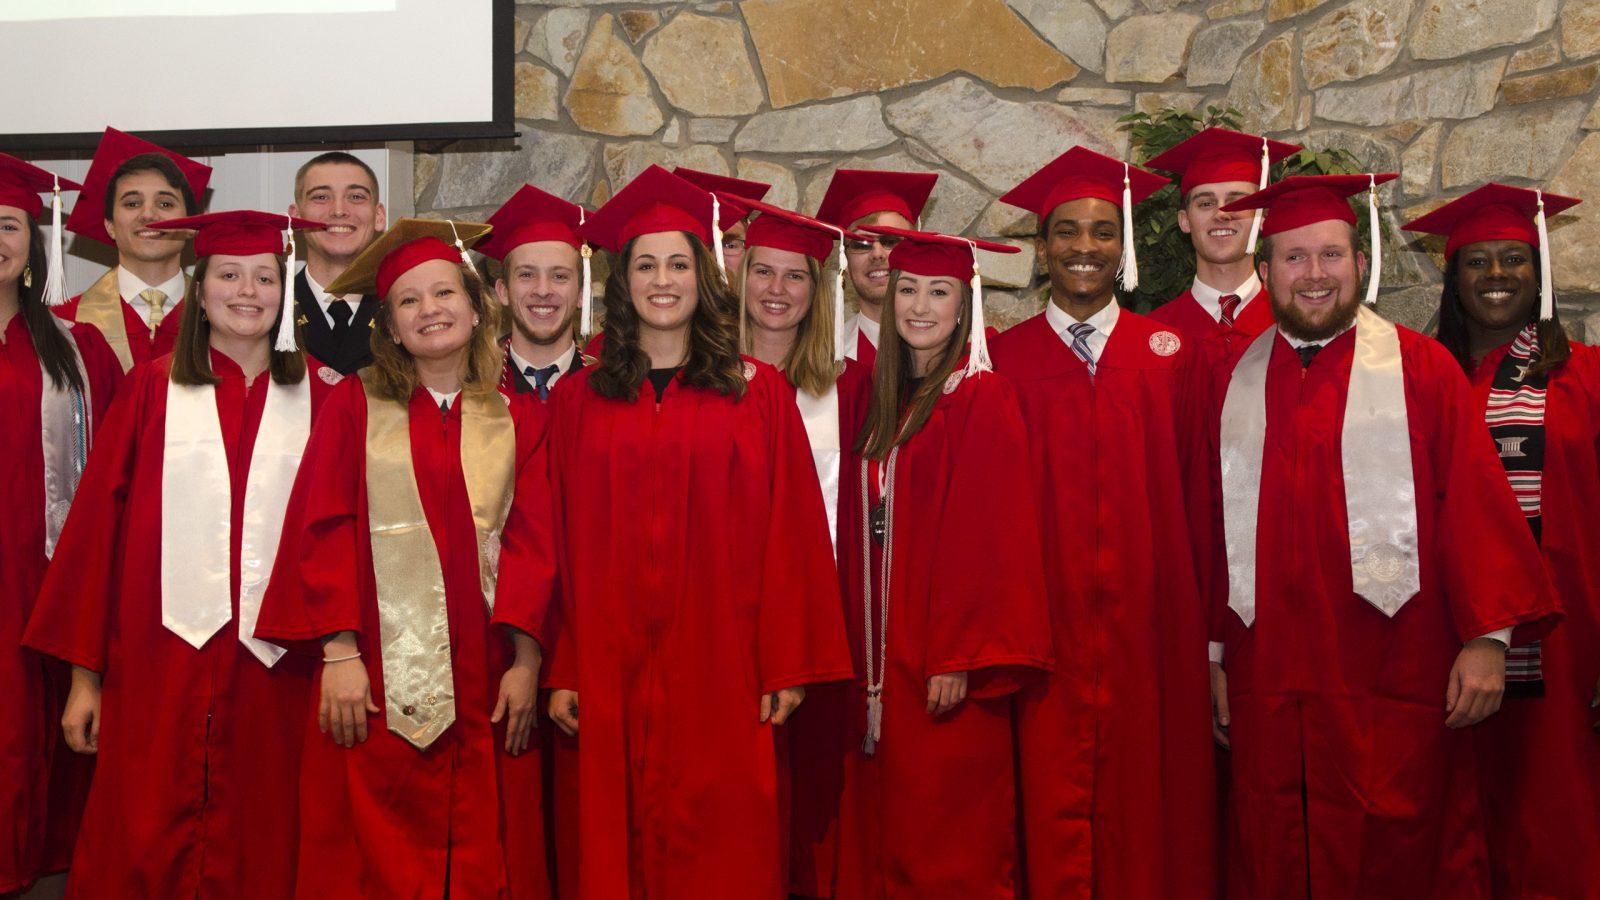 Fall 2017 Graduation Ceremony